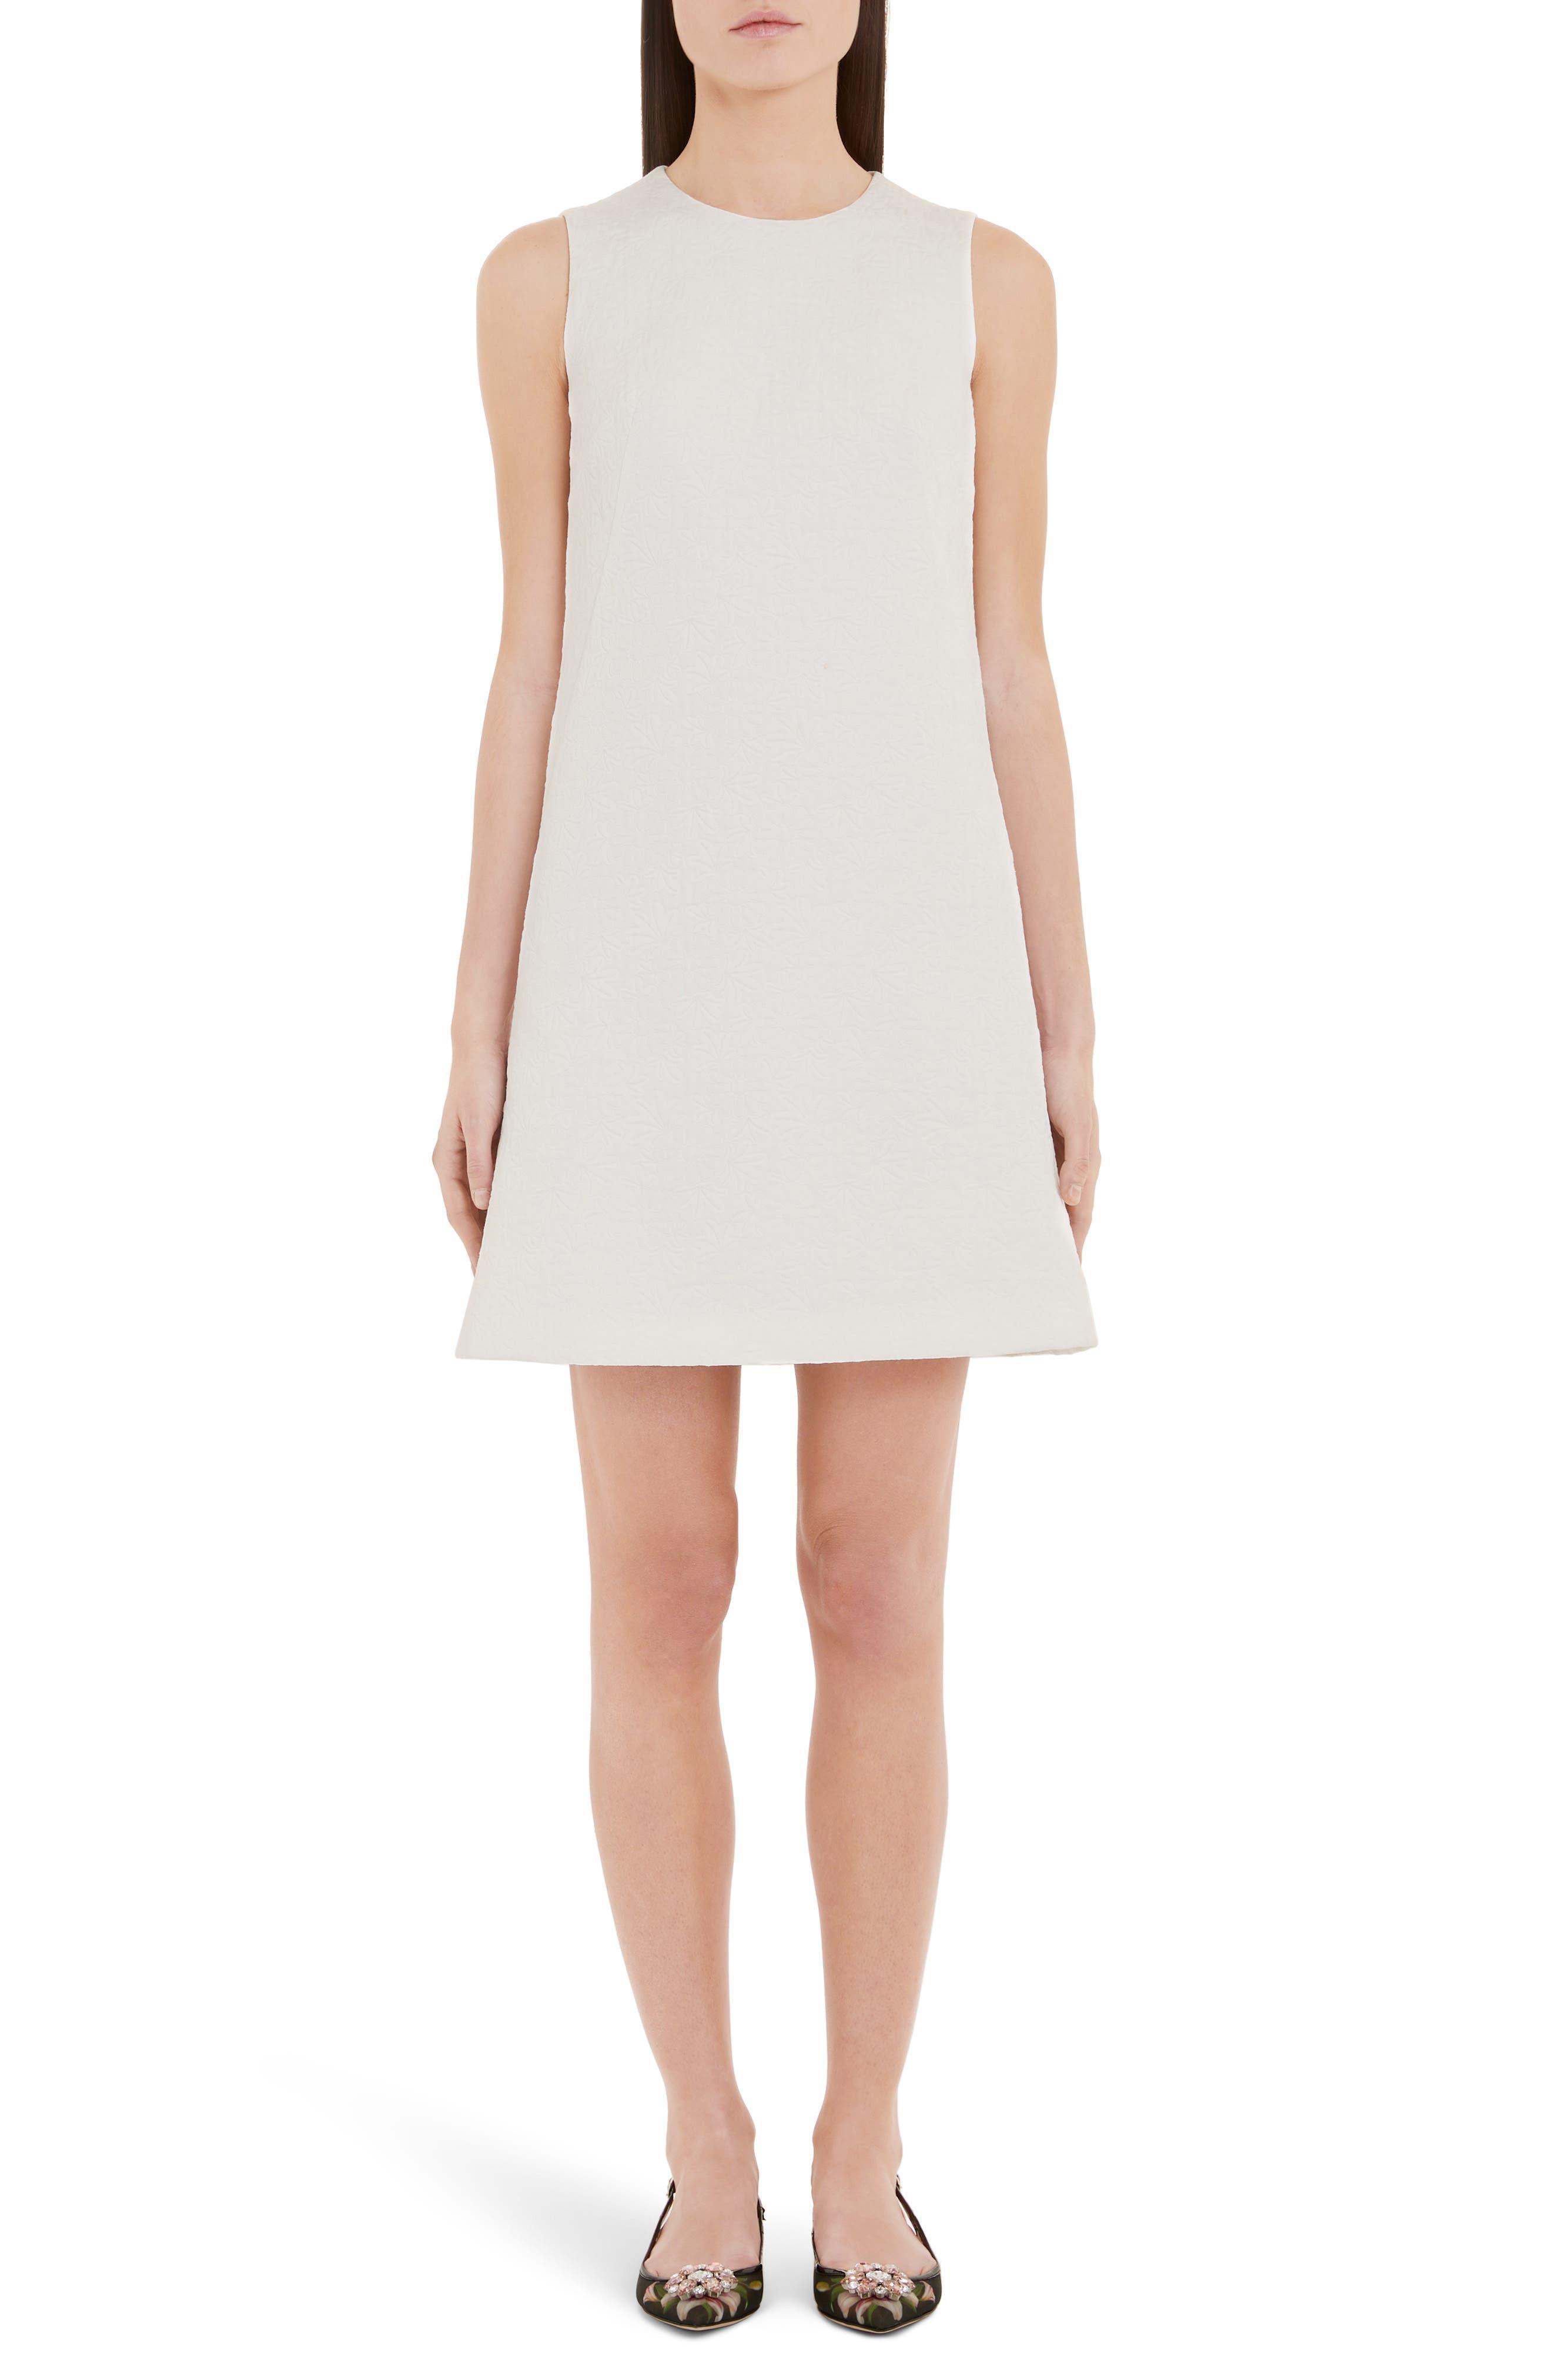 Dolce & gabbana Floral Jacquard Shift Dress, US / 40 IT - White